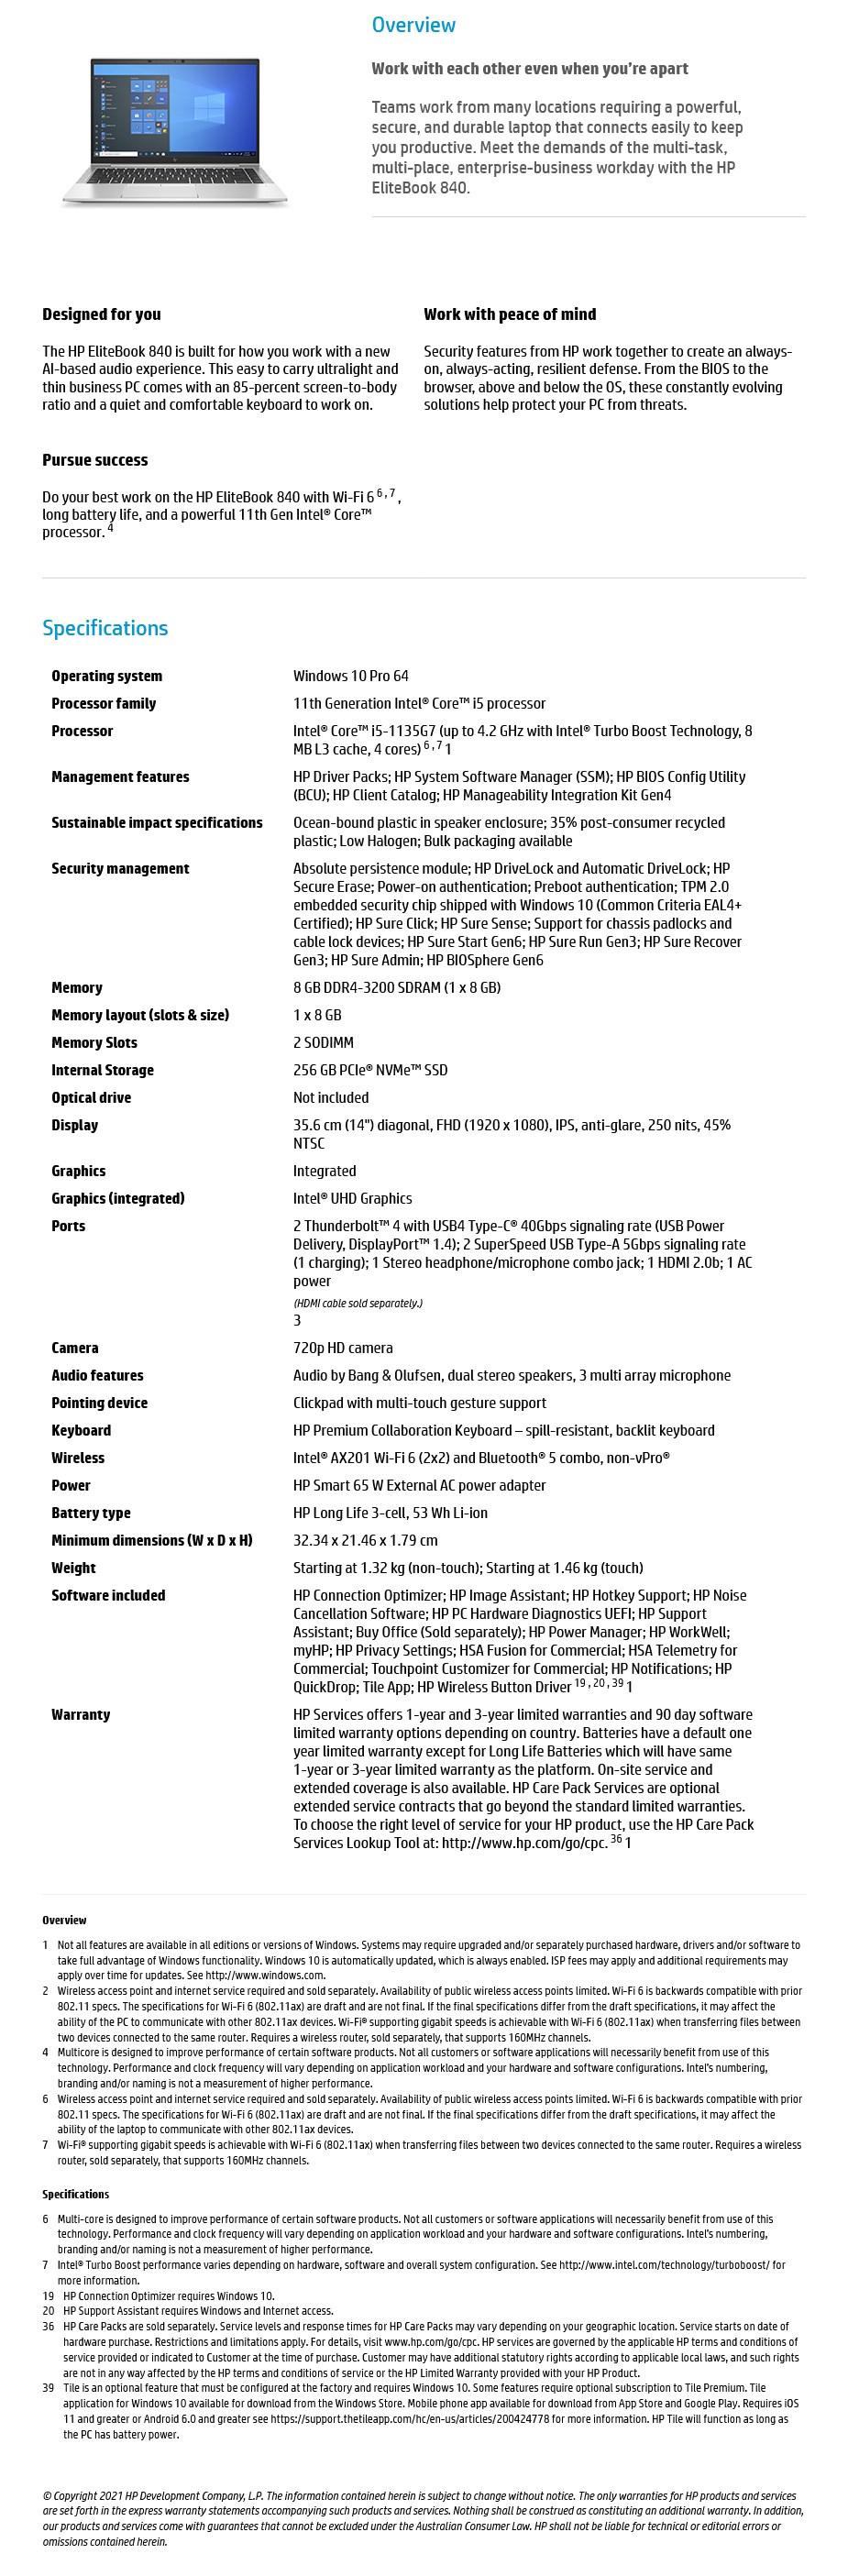 hp-elitebook-840-g8-14-laptop-i51135g7-8gb-256gb-w10p-4g-lte-ac42673-4.jpg